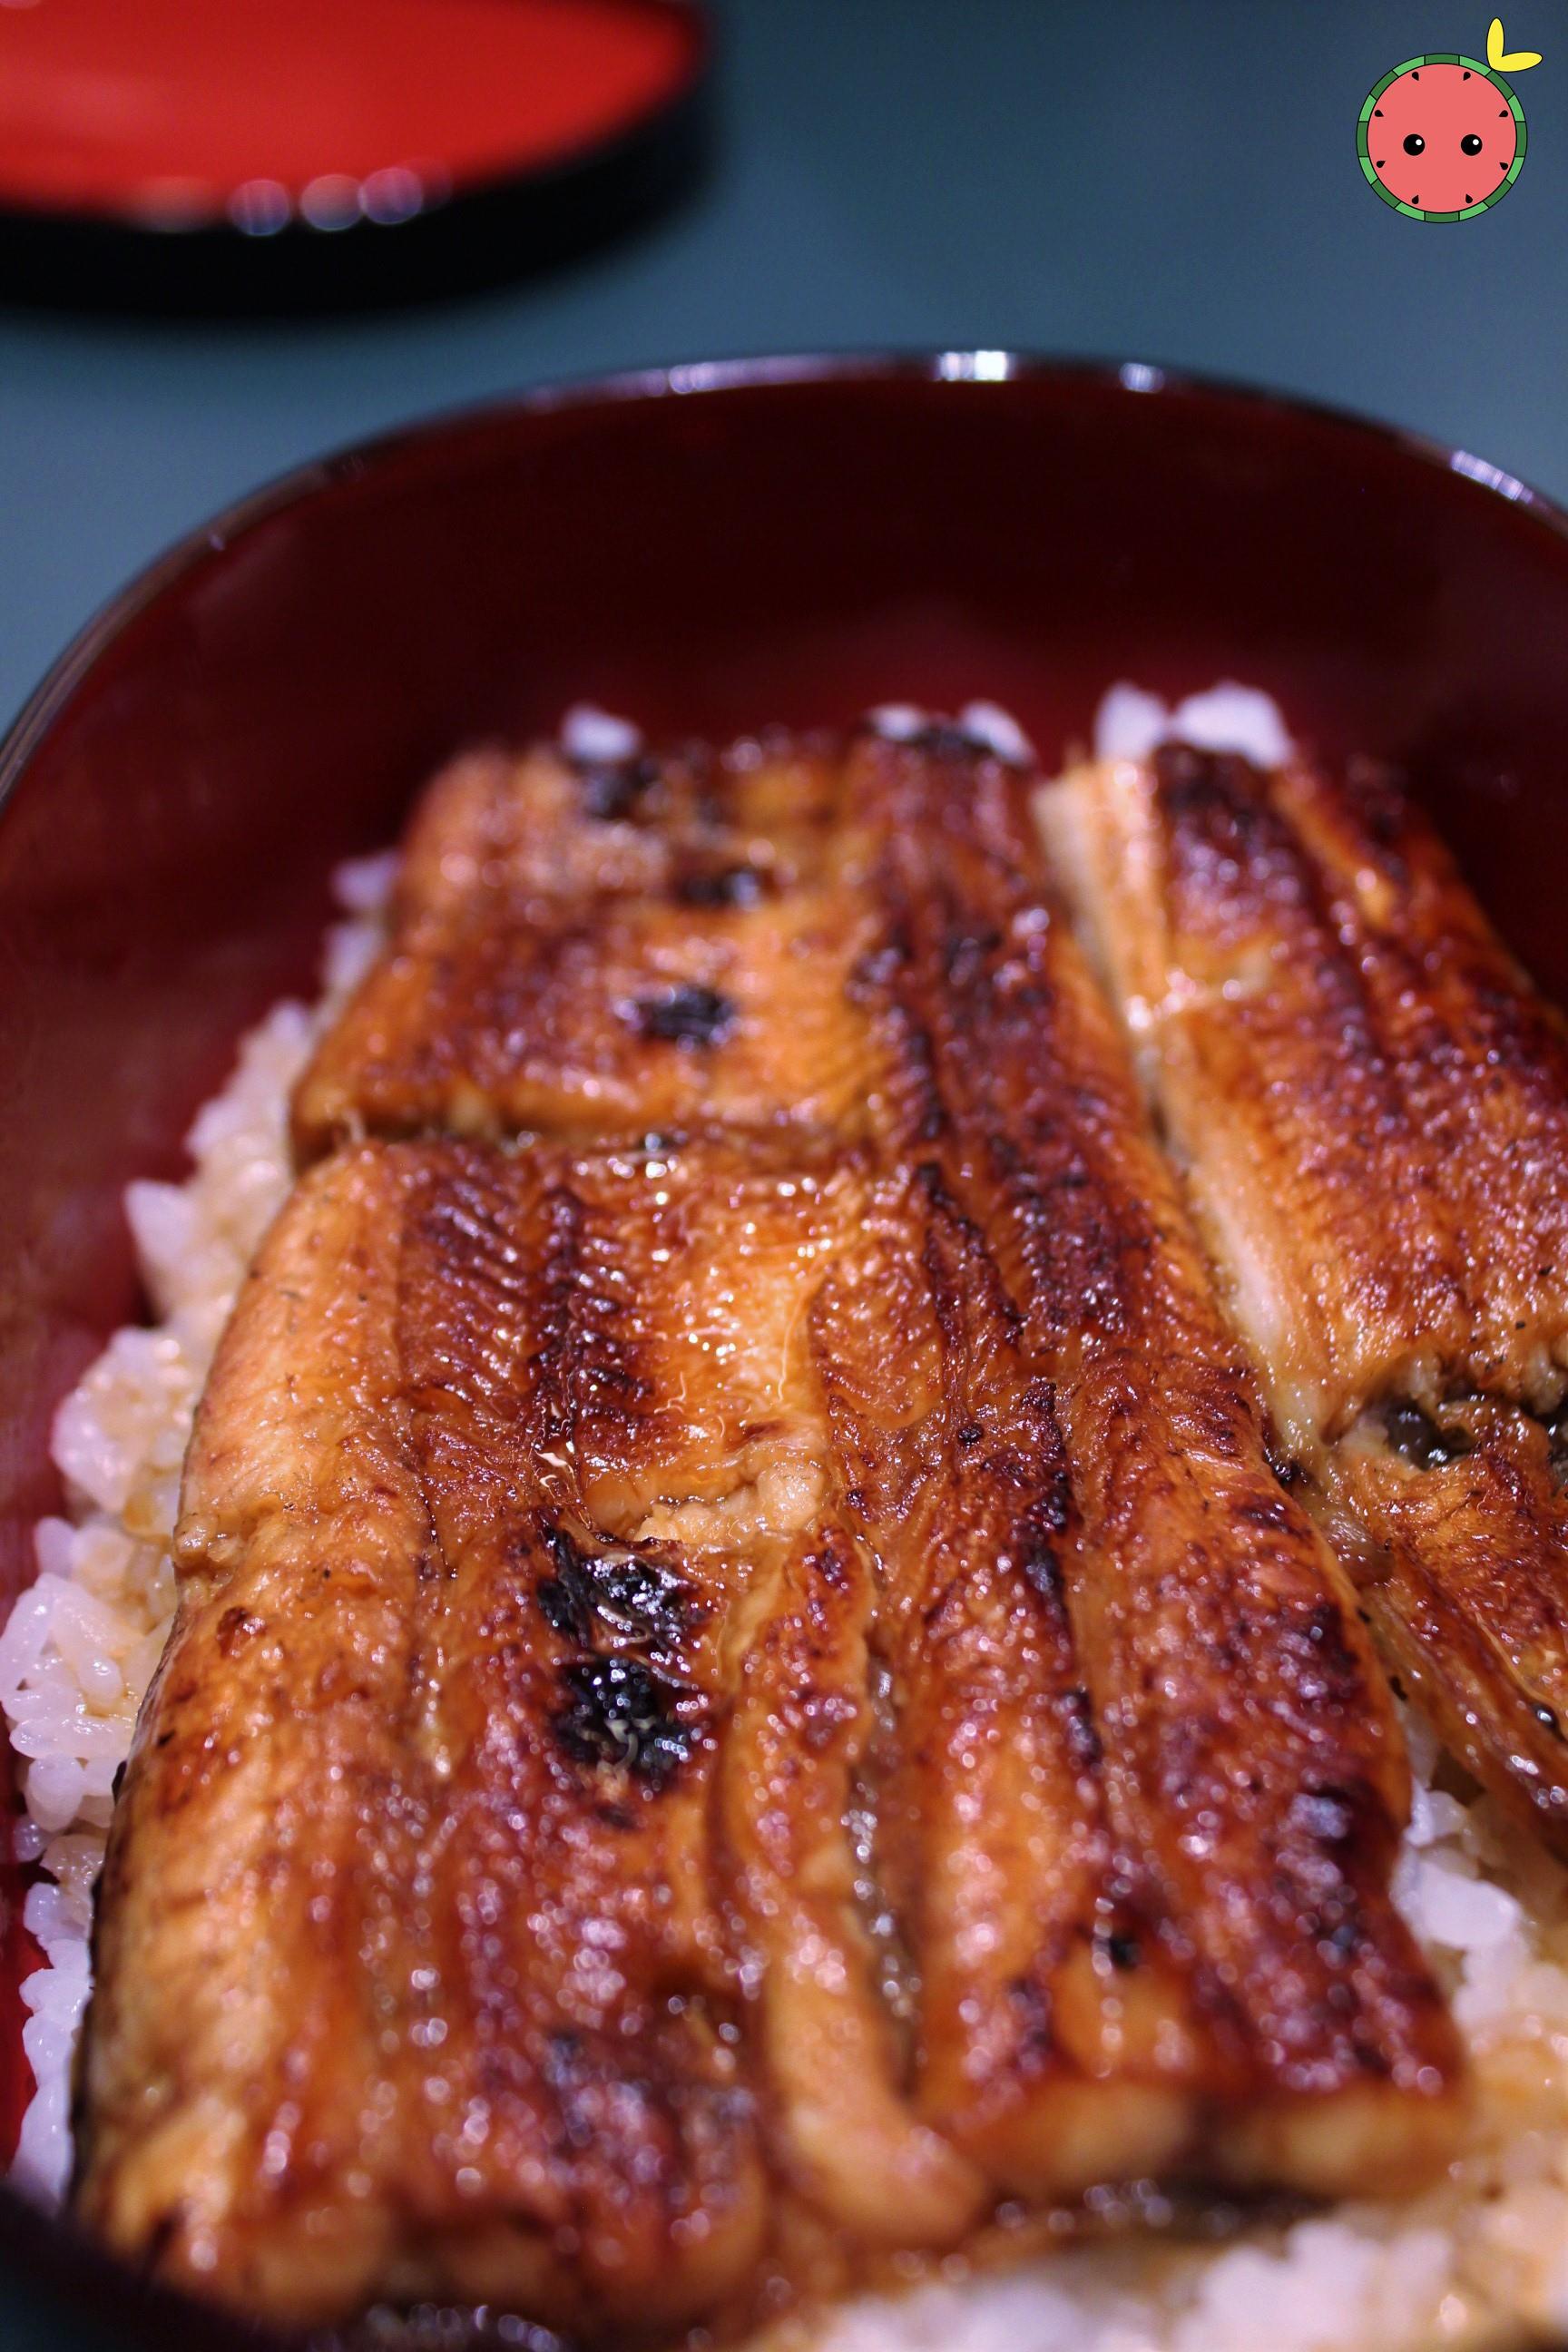 Unagi Don - Grilled Eel Rice Bowl 2